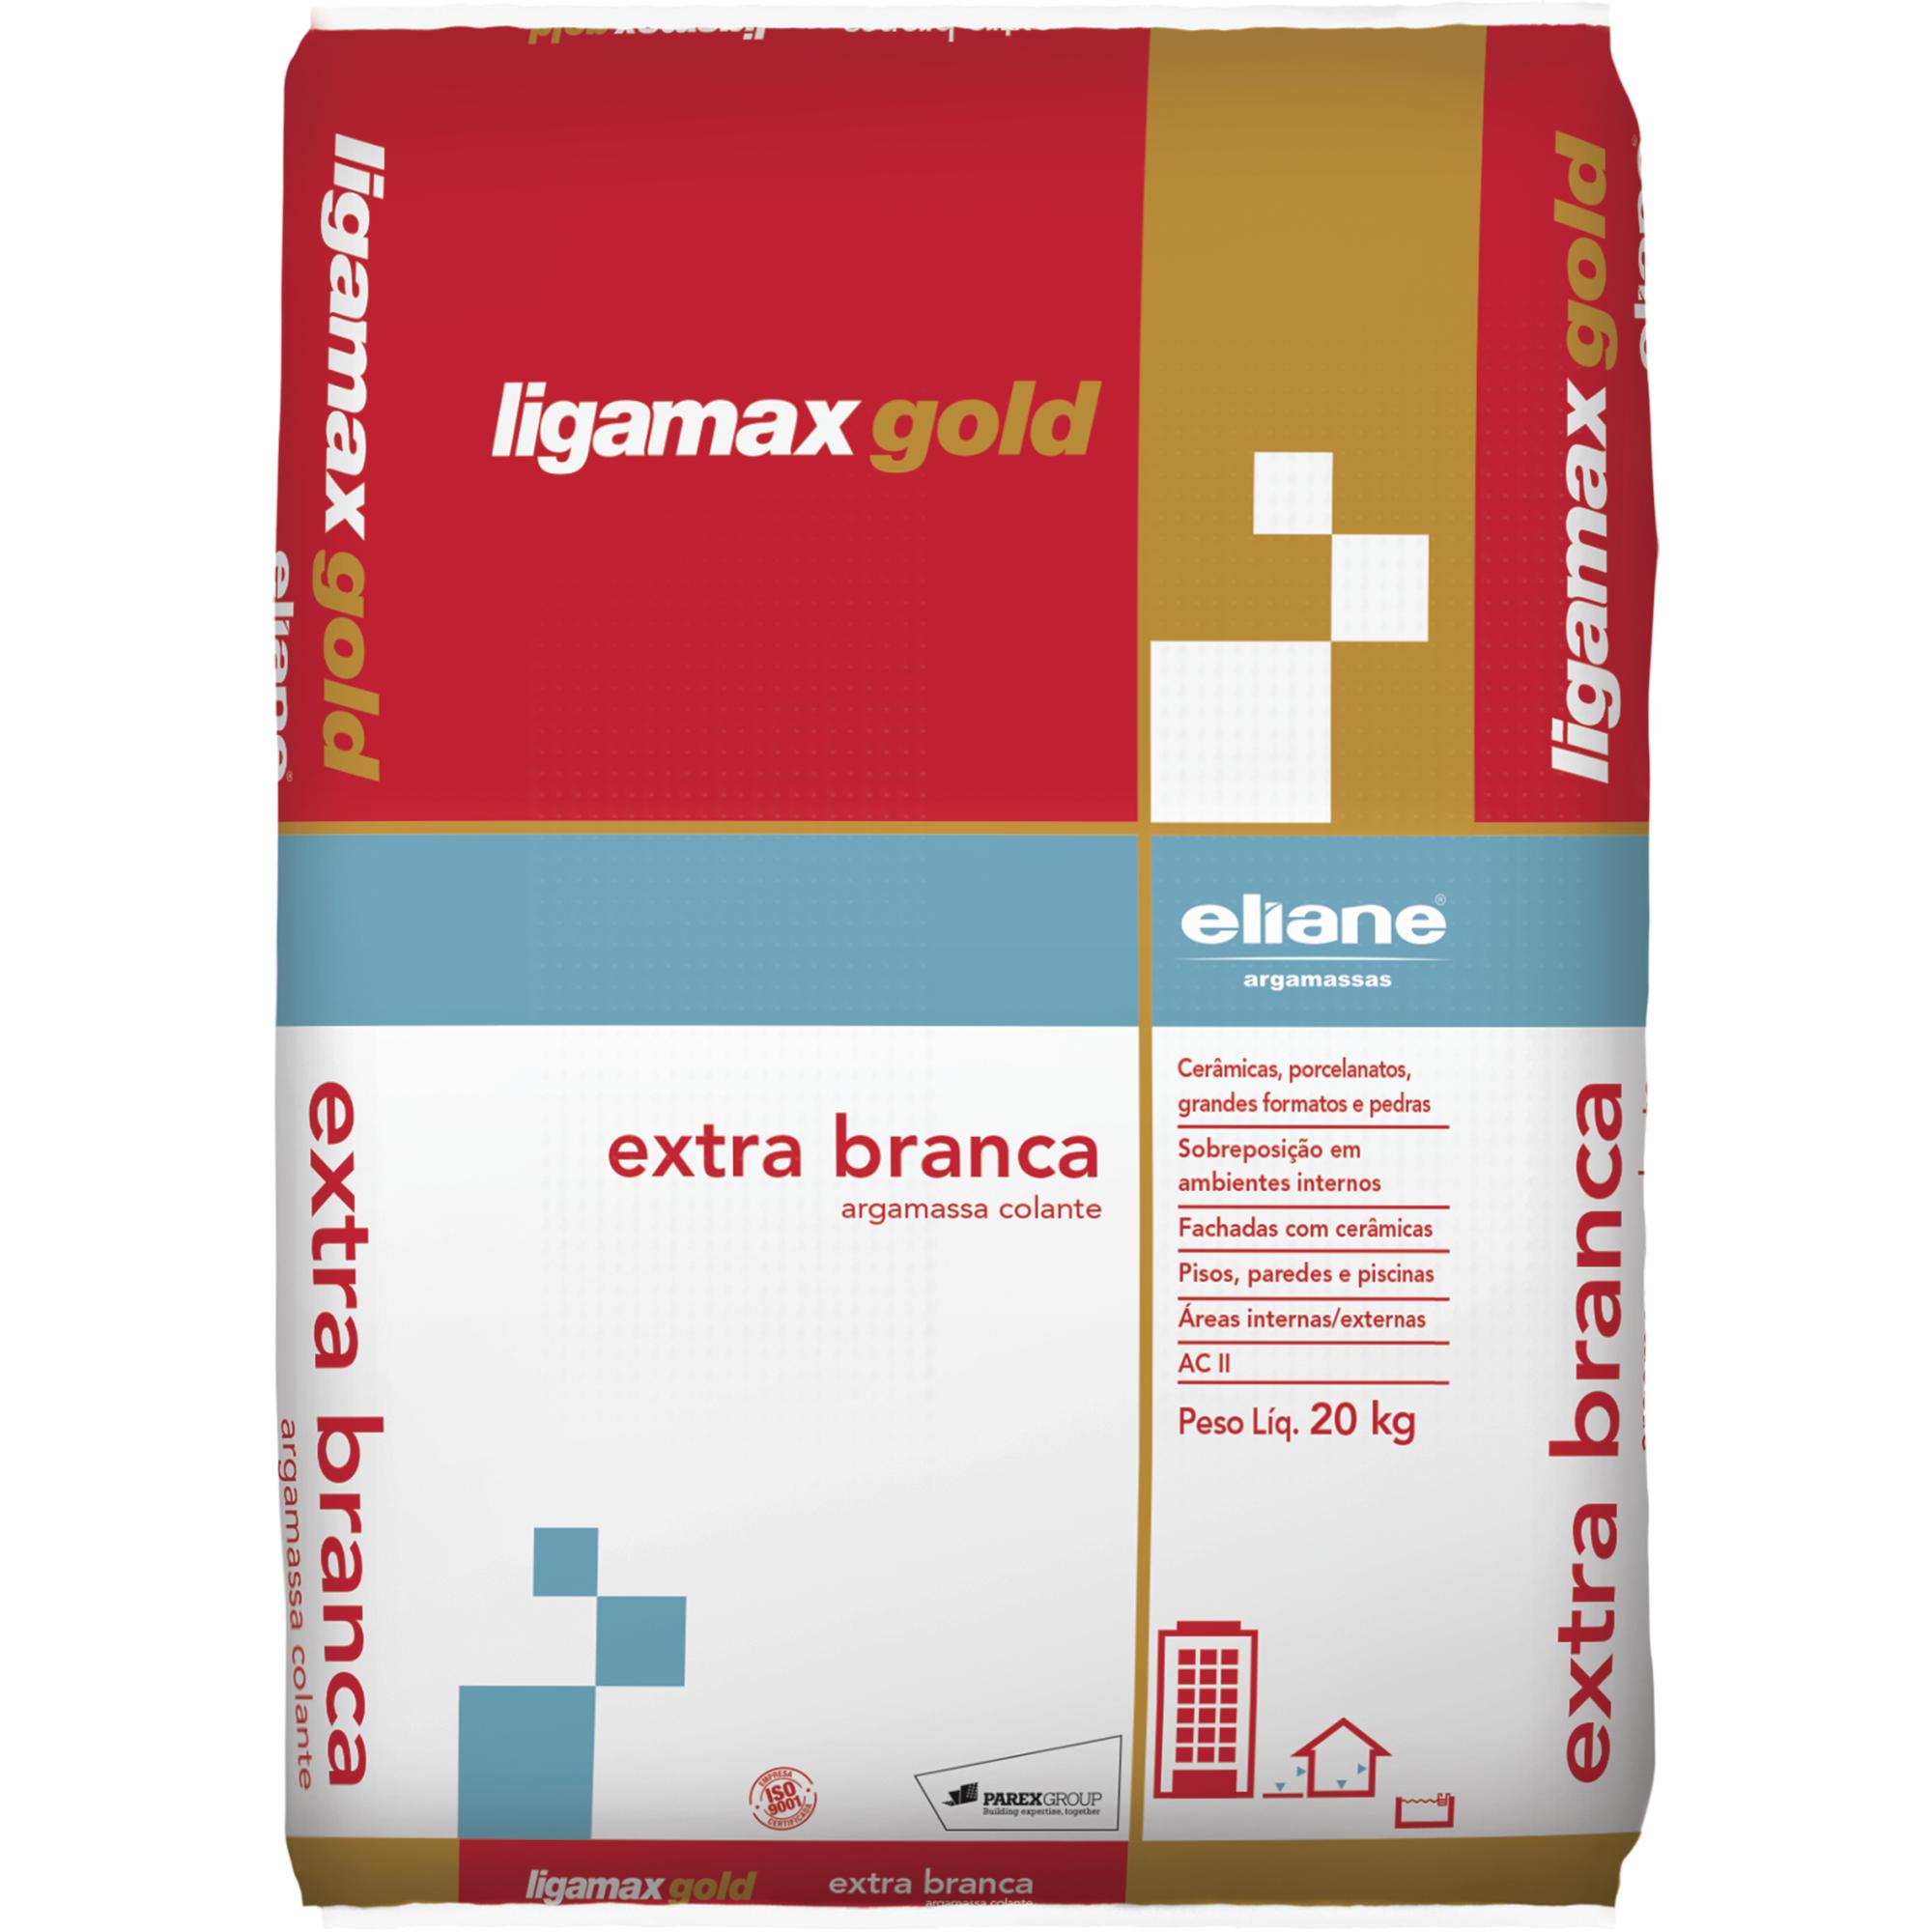 Argamassa ACII Ligamax Externo Branco Saco20kg - Eliane